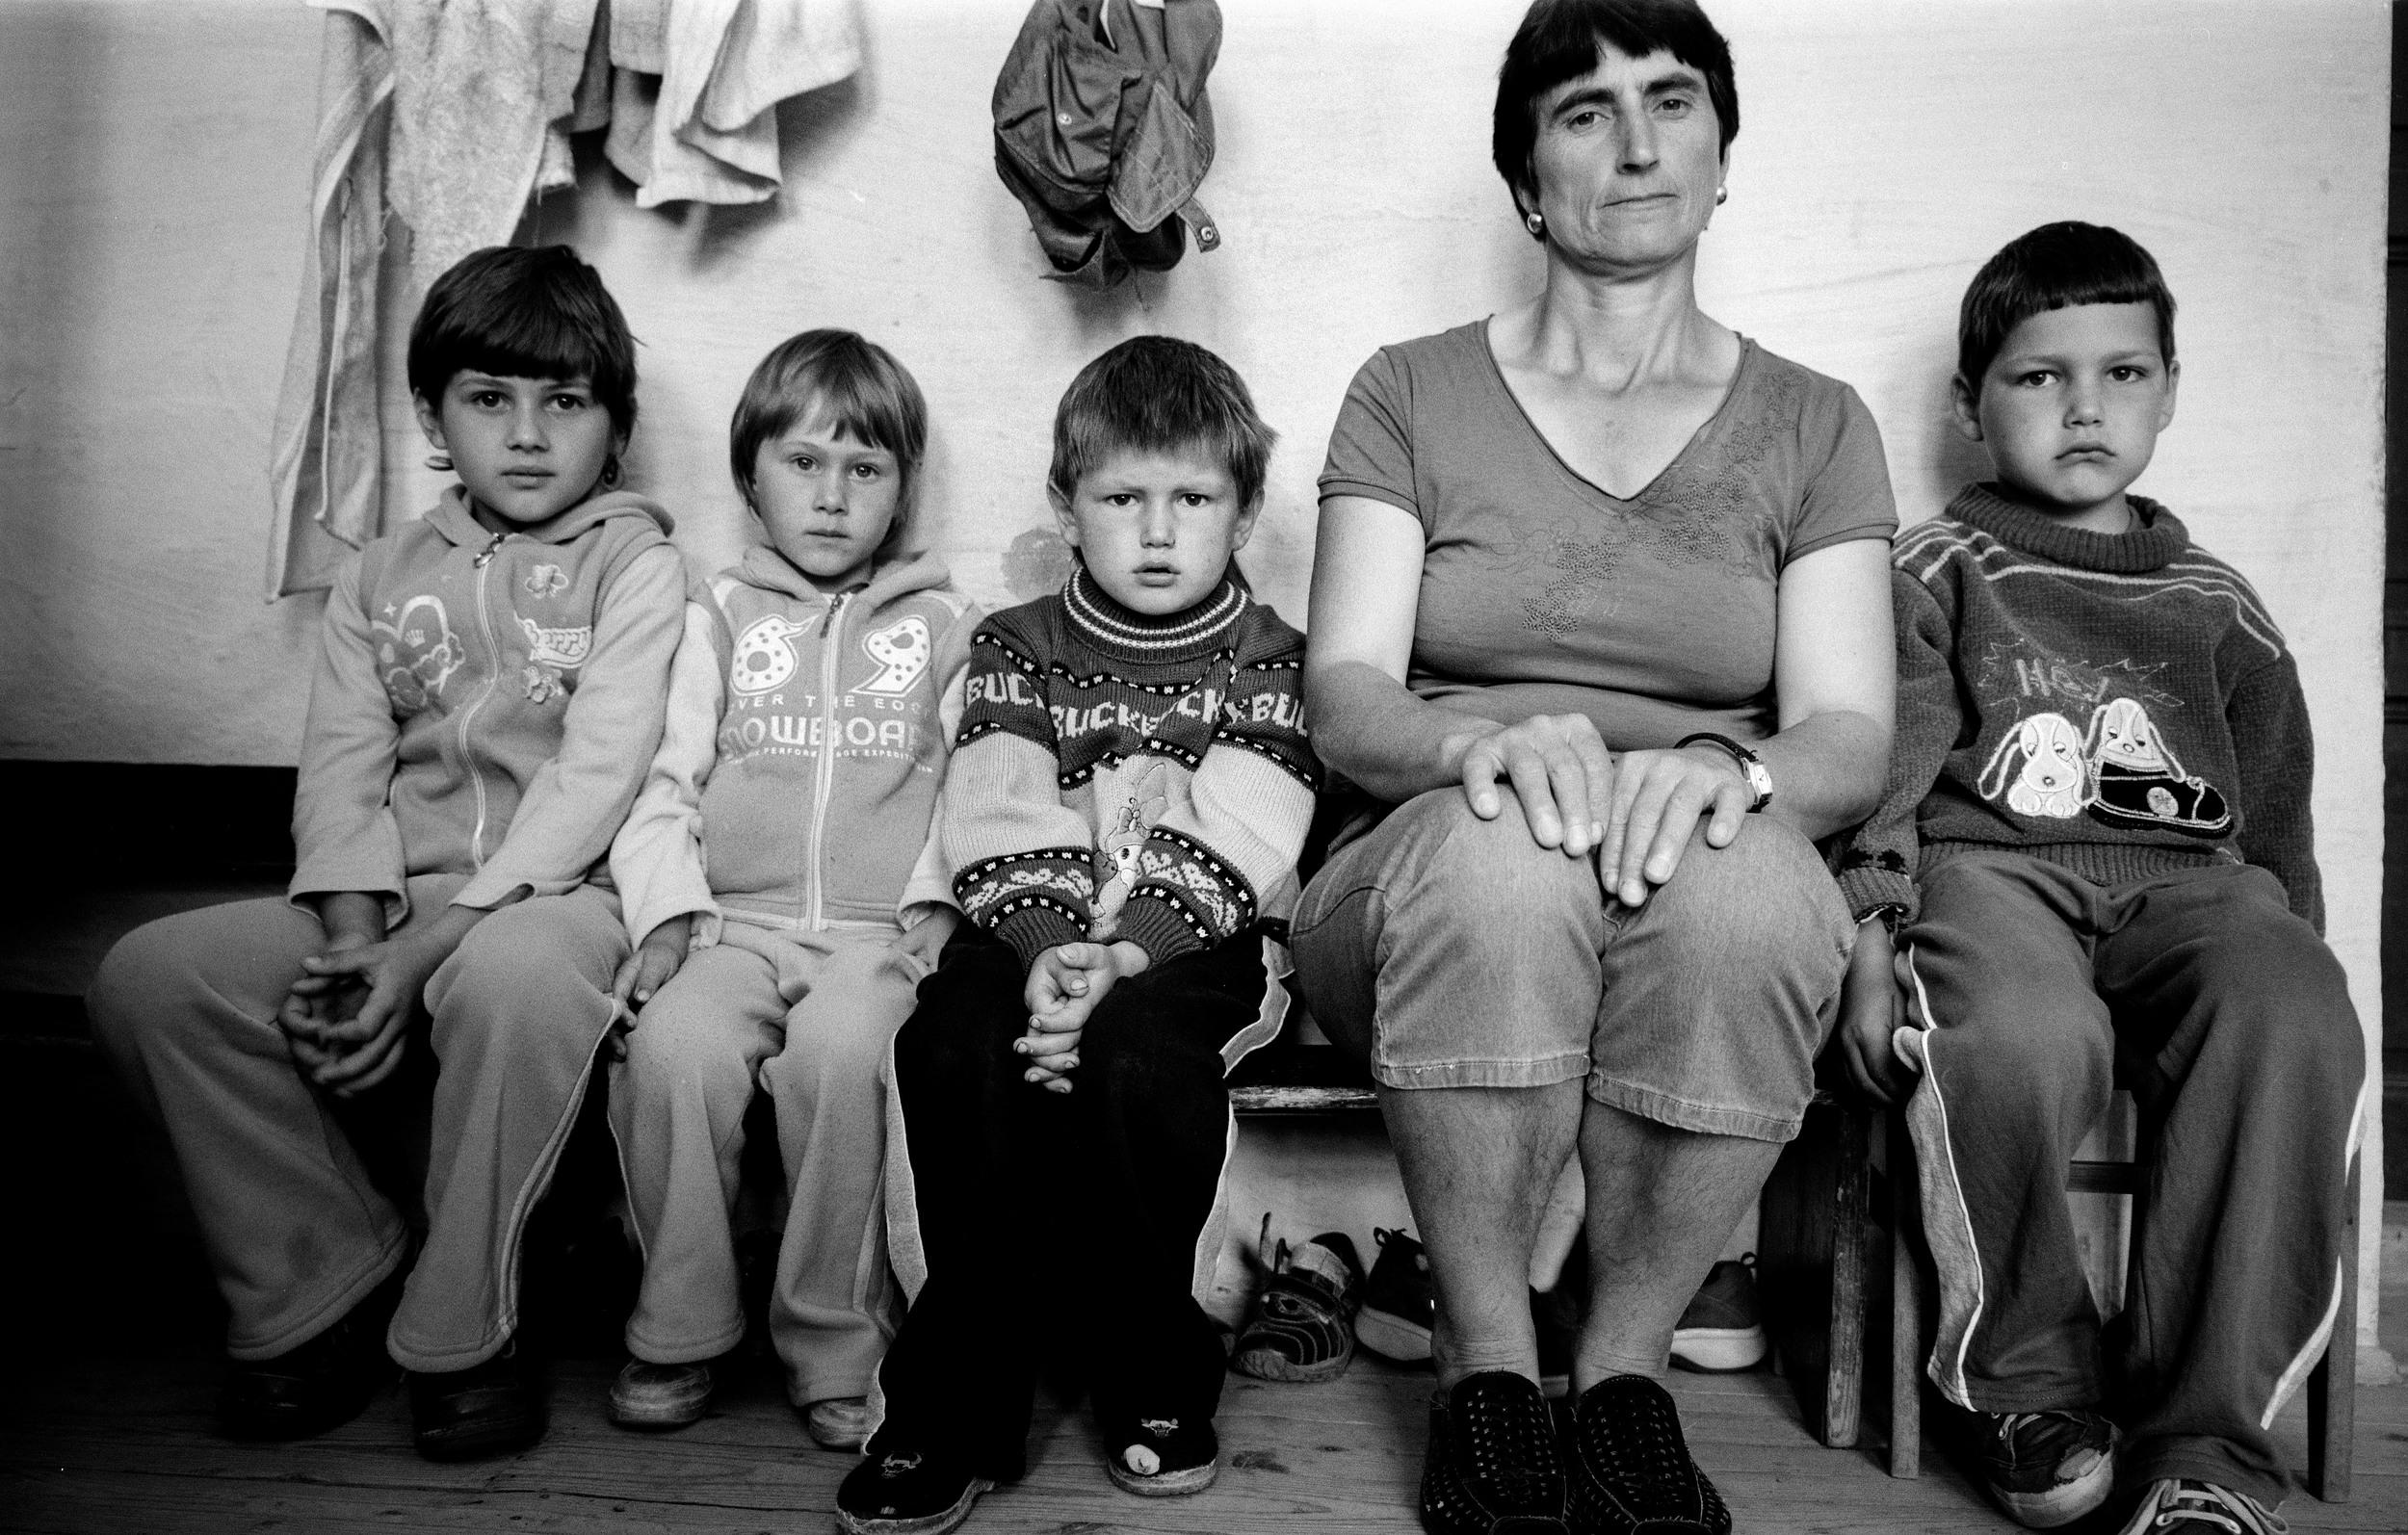 Kindergarten. Siklód, Romania, 2009